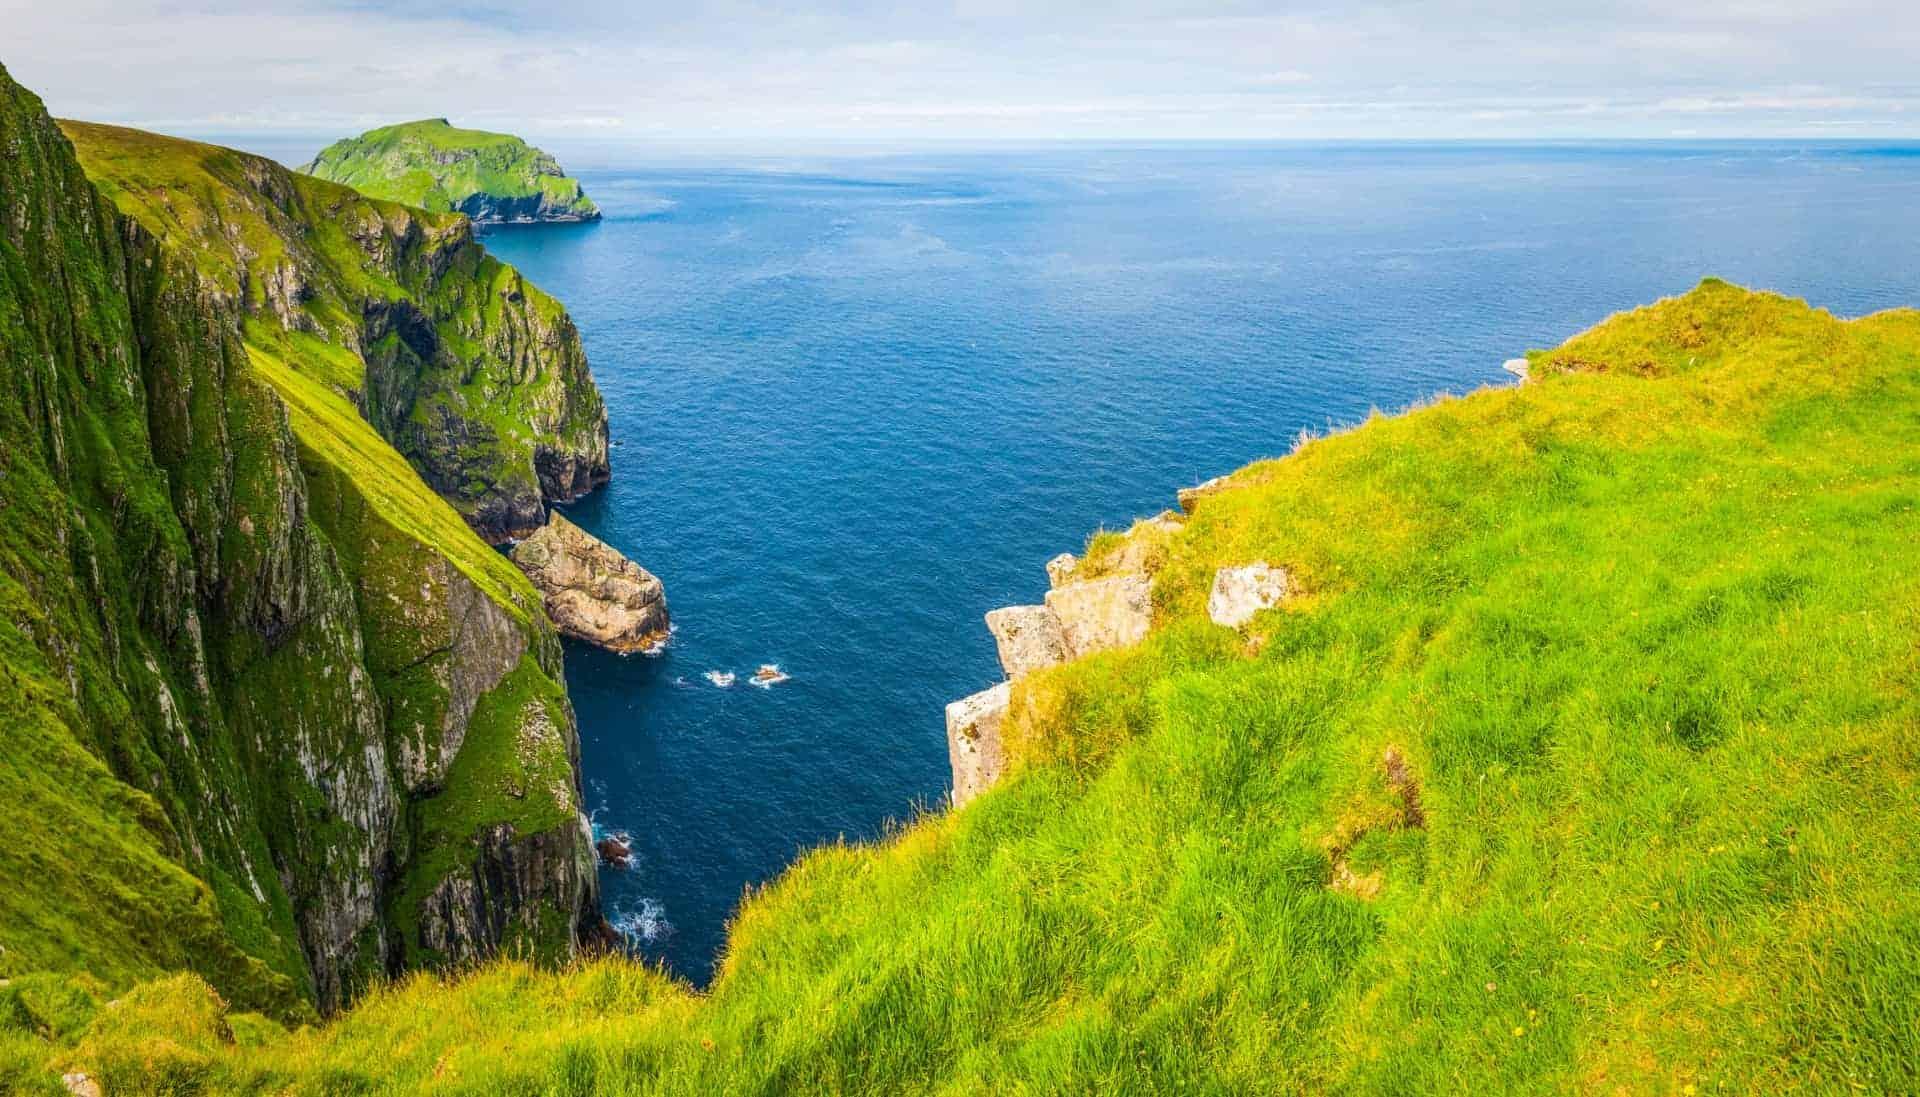 Dramatic sea cliffs St Kilda Outer Hebrides